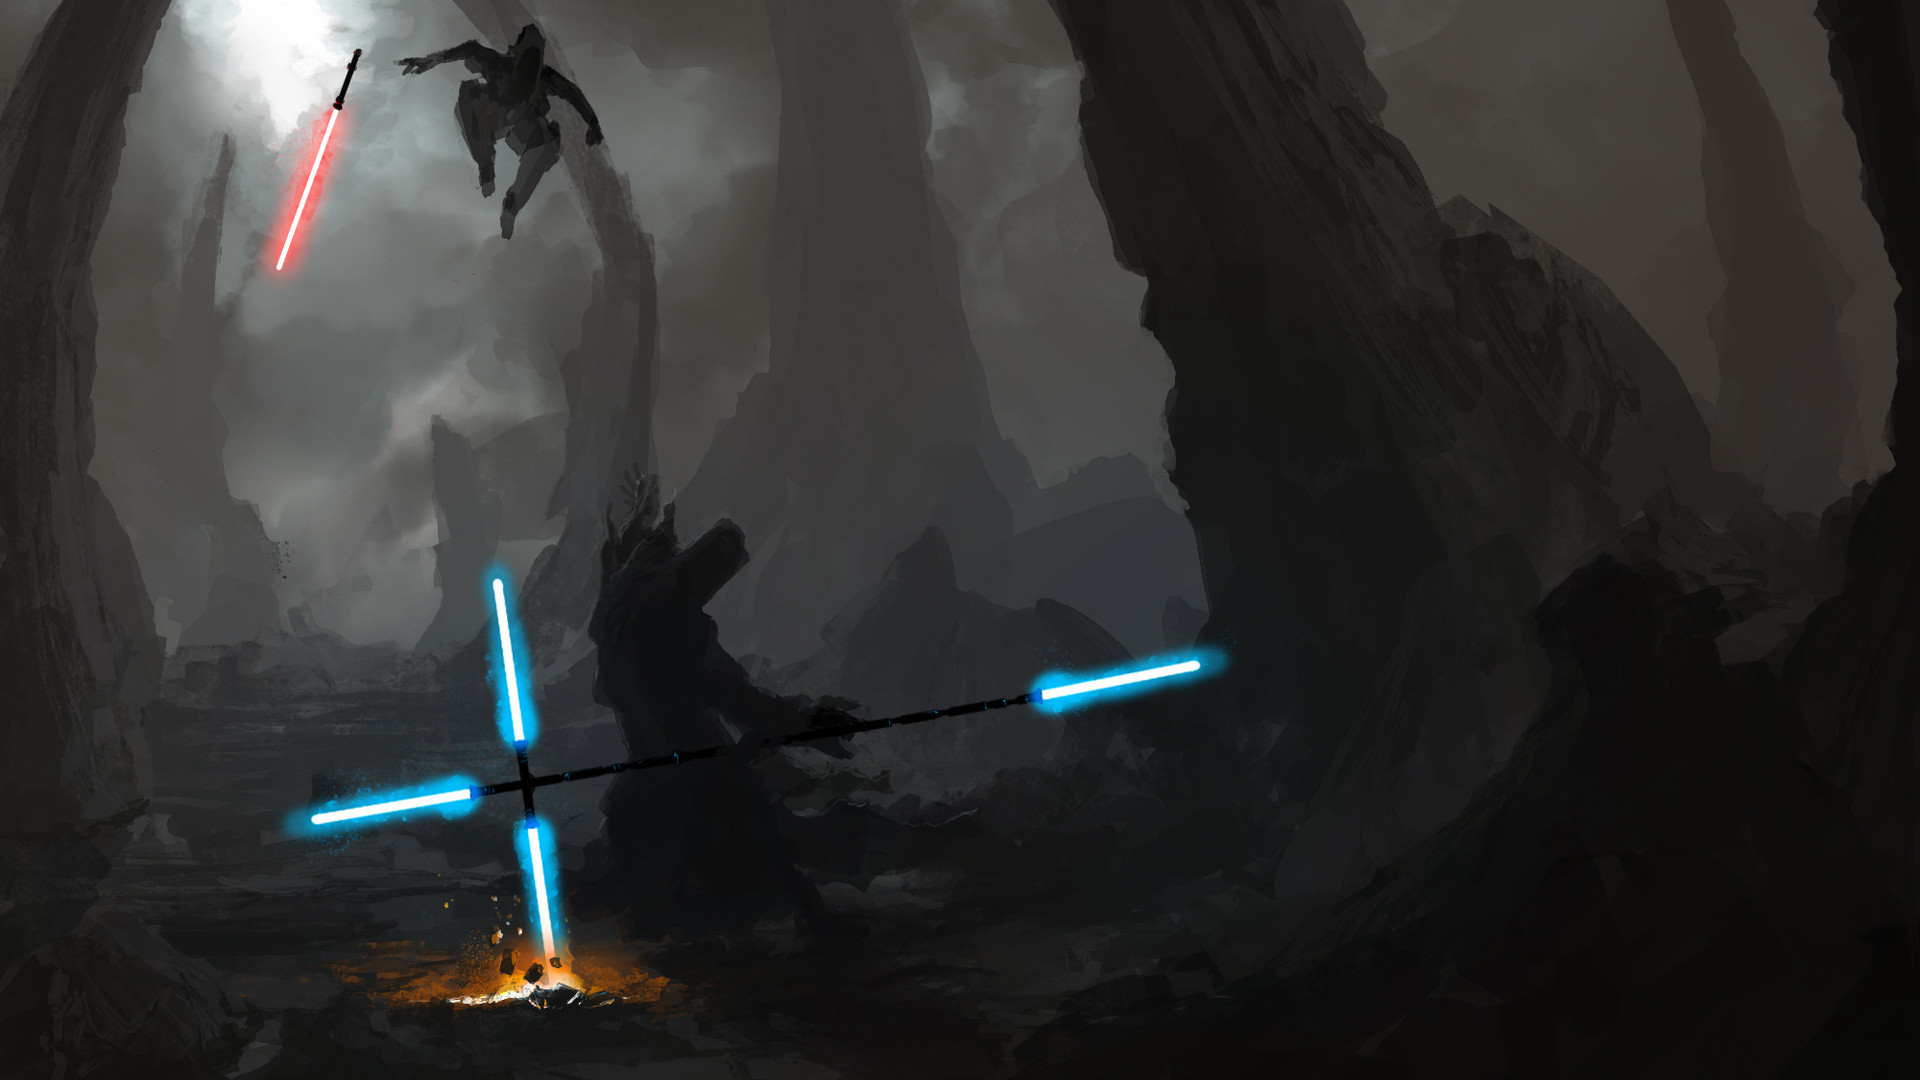 Kylo Ren Star Wars The Force Awaken HD desktop wallpaper .